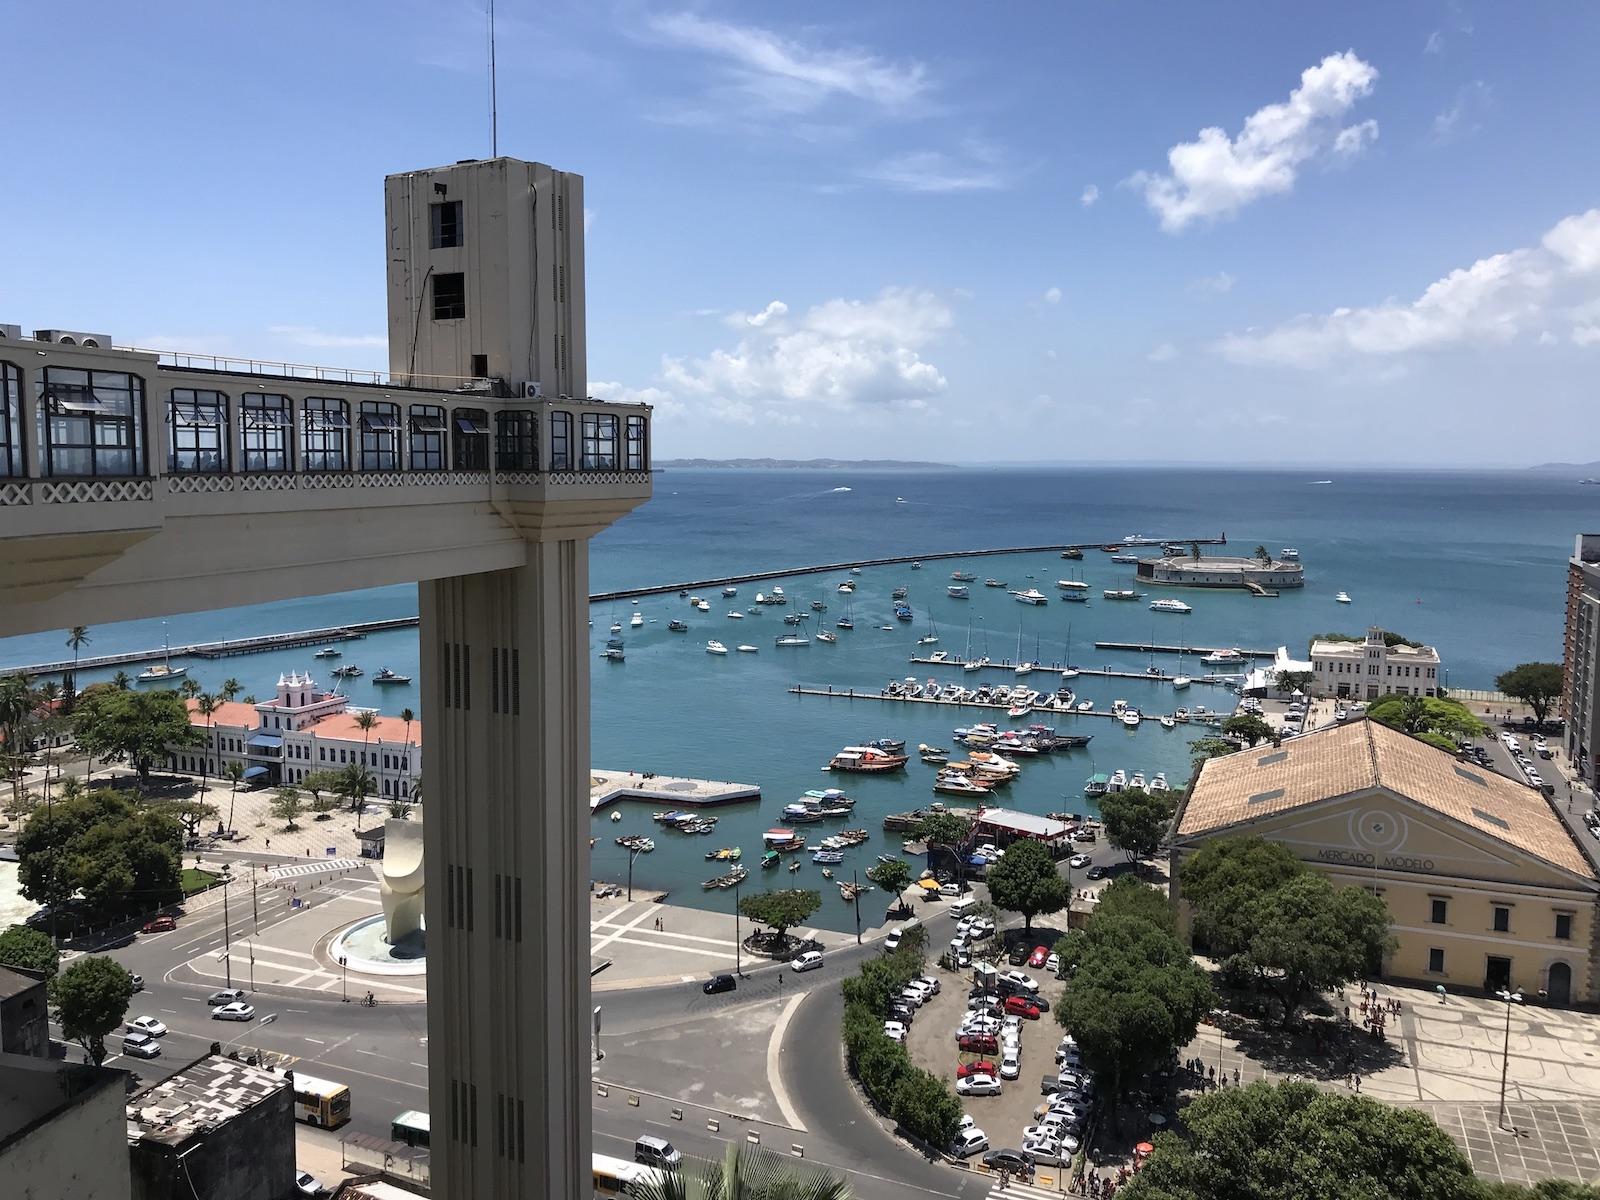 tourameo-reiseplanung-gruppenreise-brasilien-salvador-elevador-lacerda